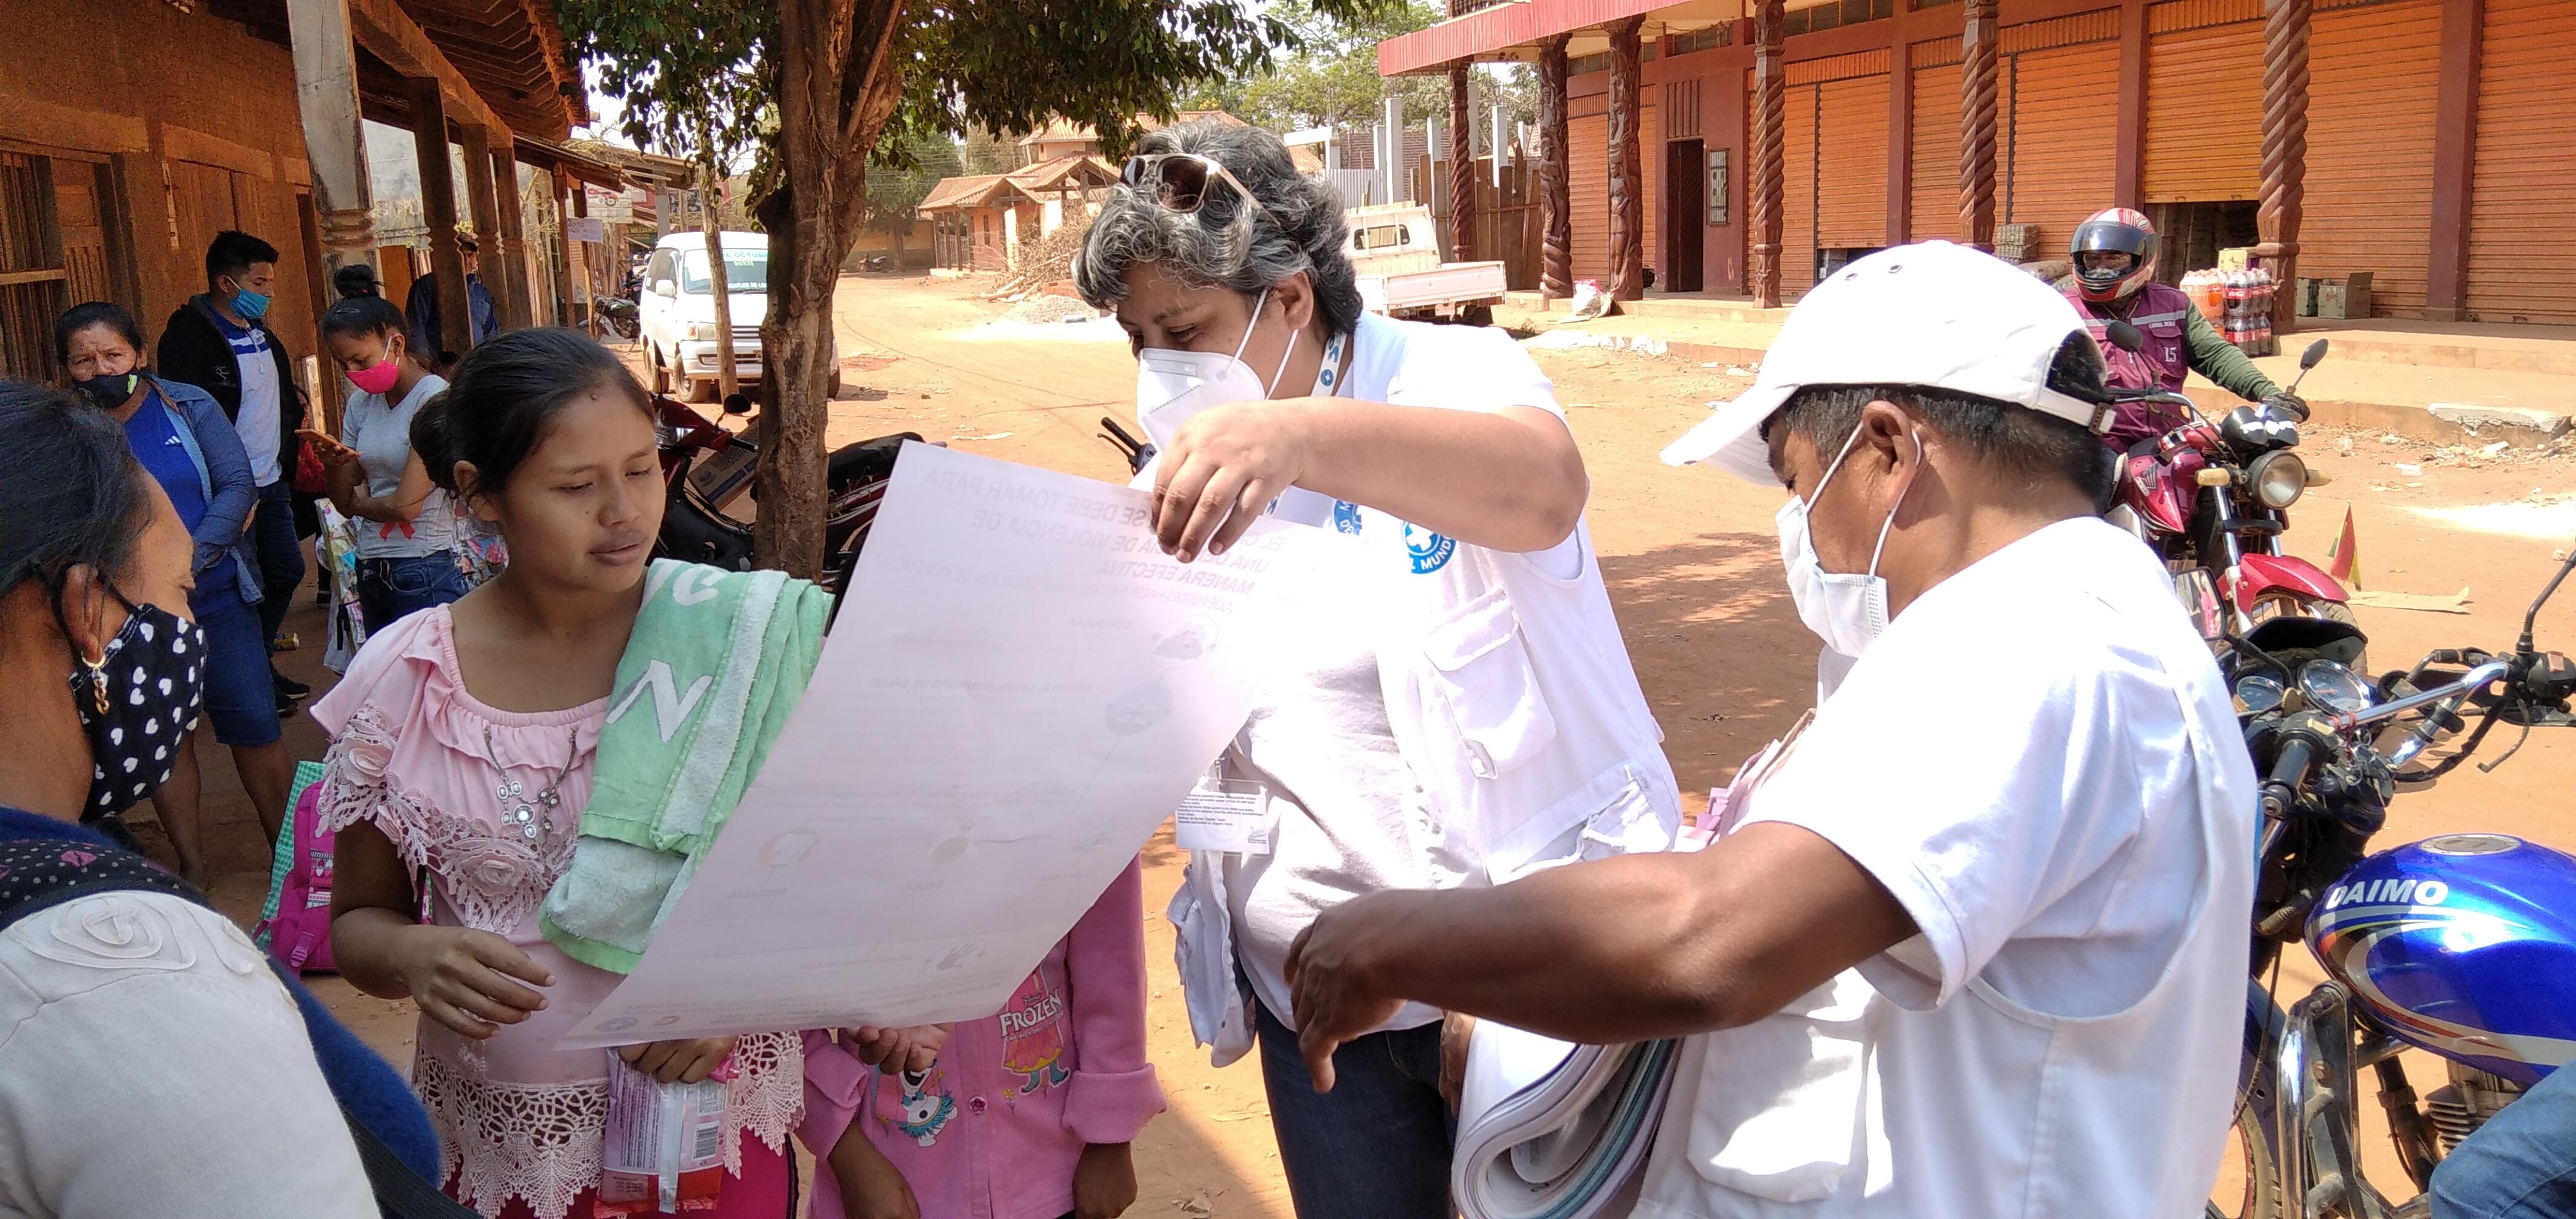 Informando para prevenir la pandemia en San Ignacio de Velasco.  Bolivia. ©Claudia Belaunde